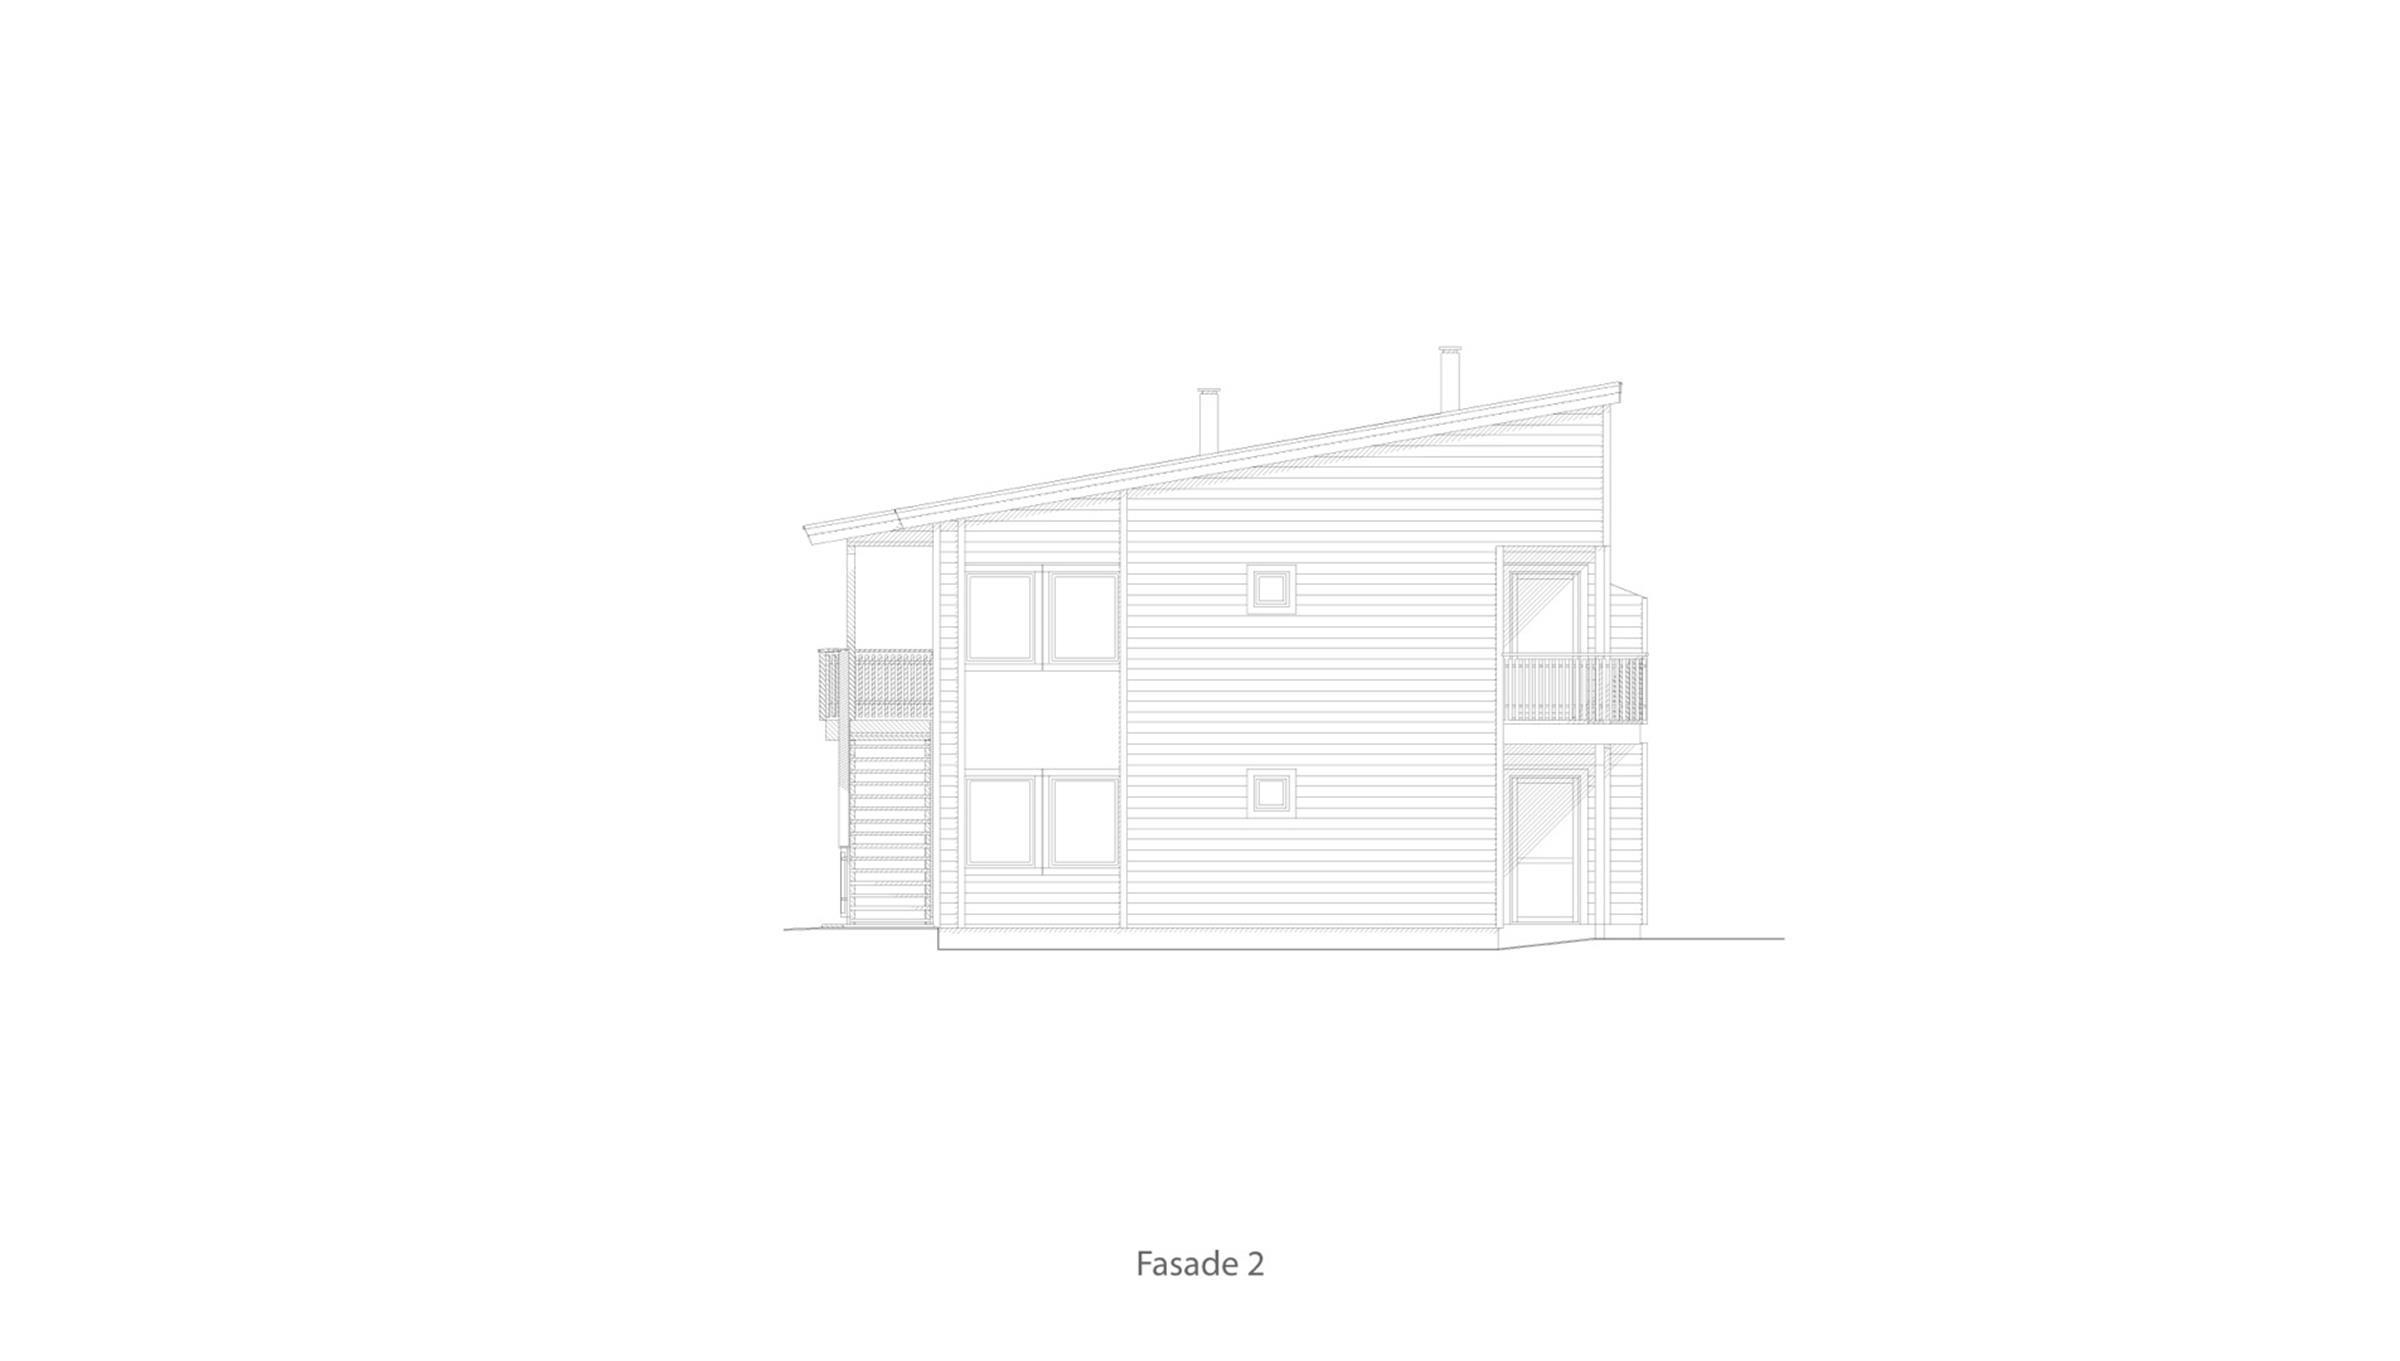 Egersund fasade 2